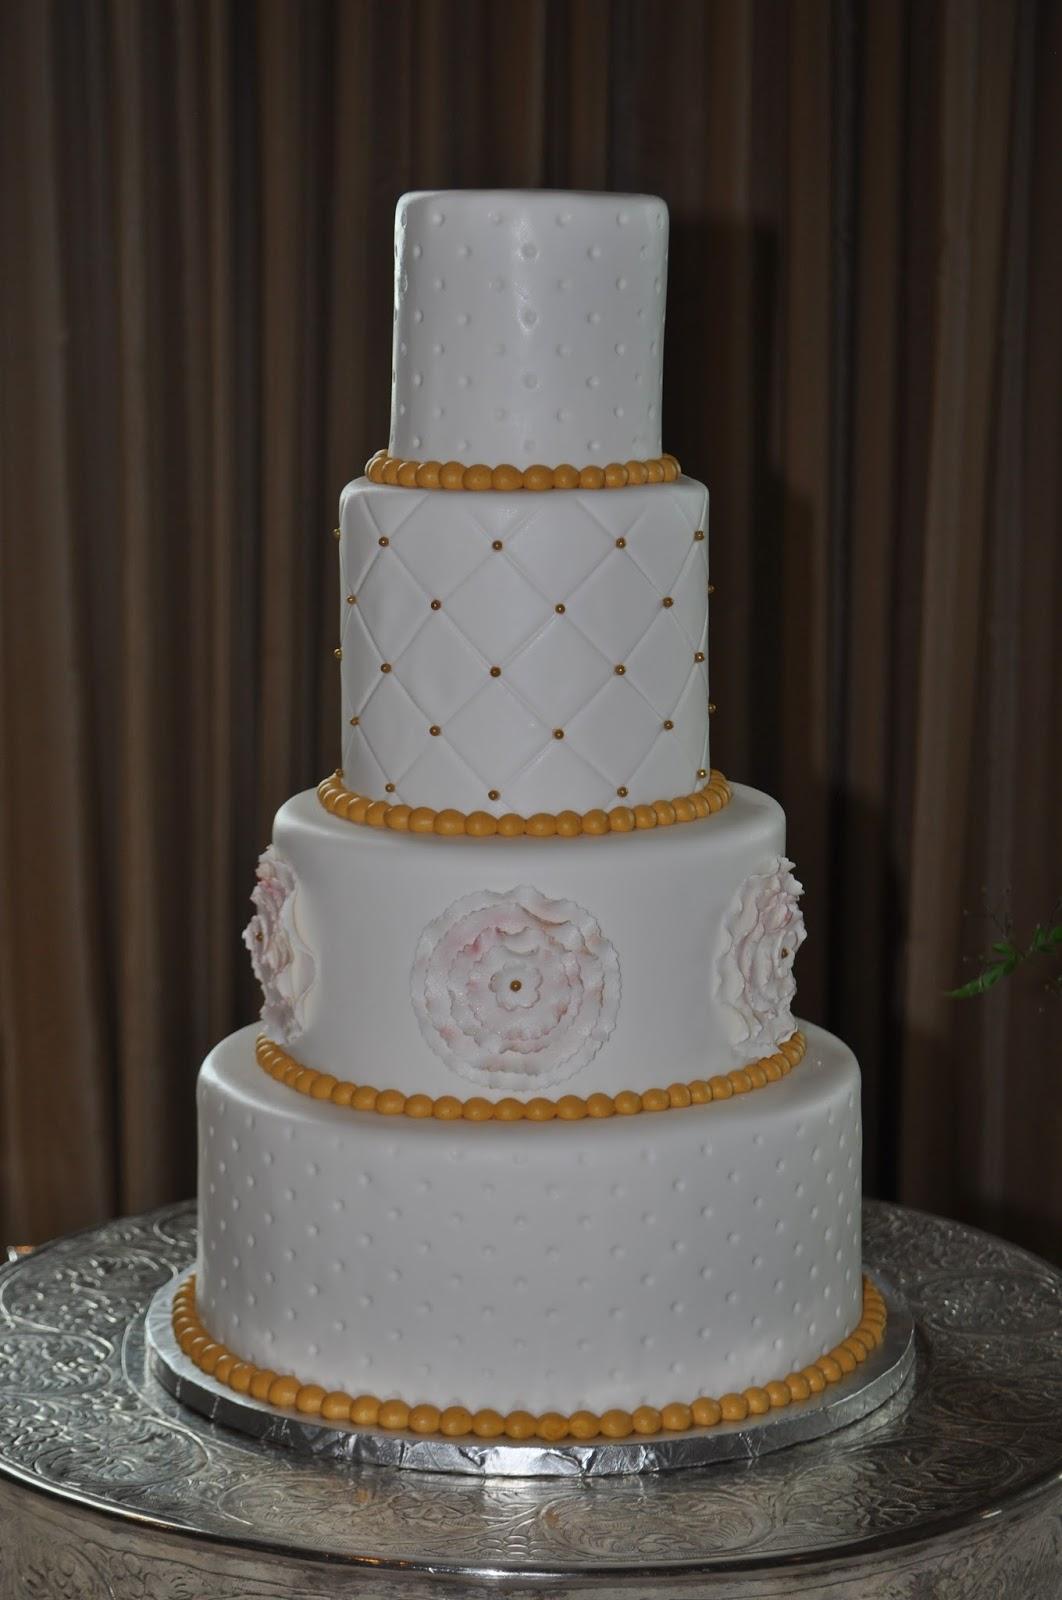 Leahs Sweet Treats Sprinkle Cakes Wedding Cakes Custom Cakes